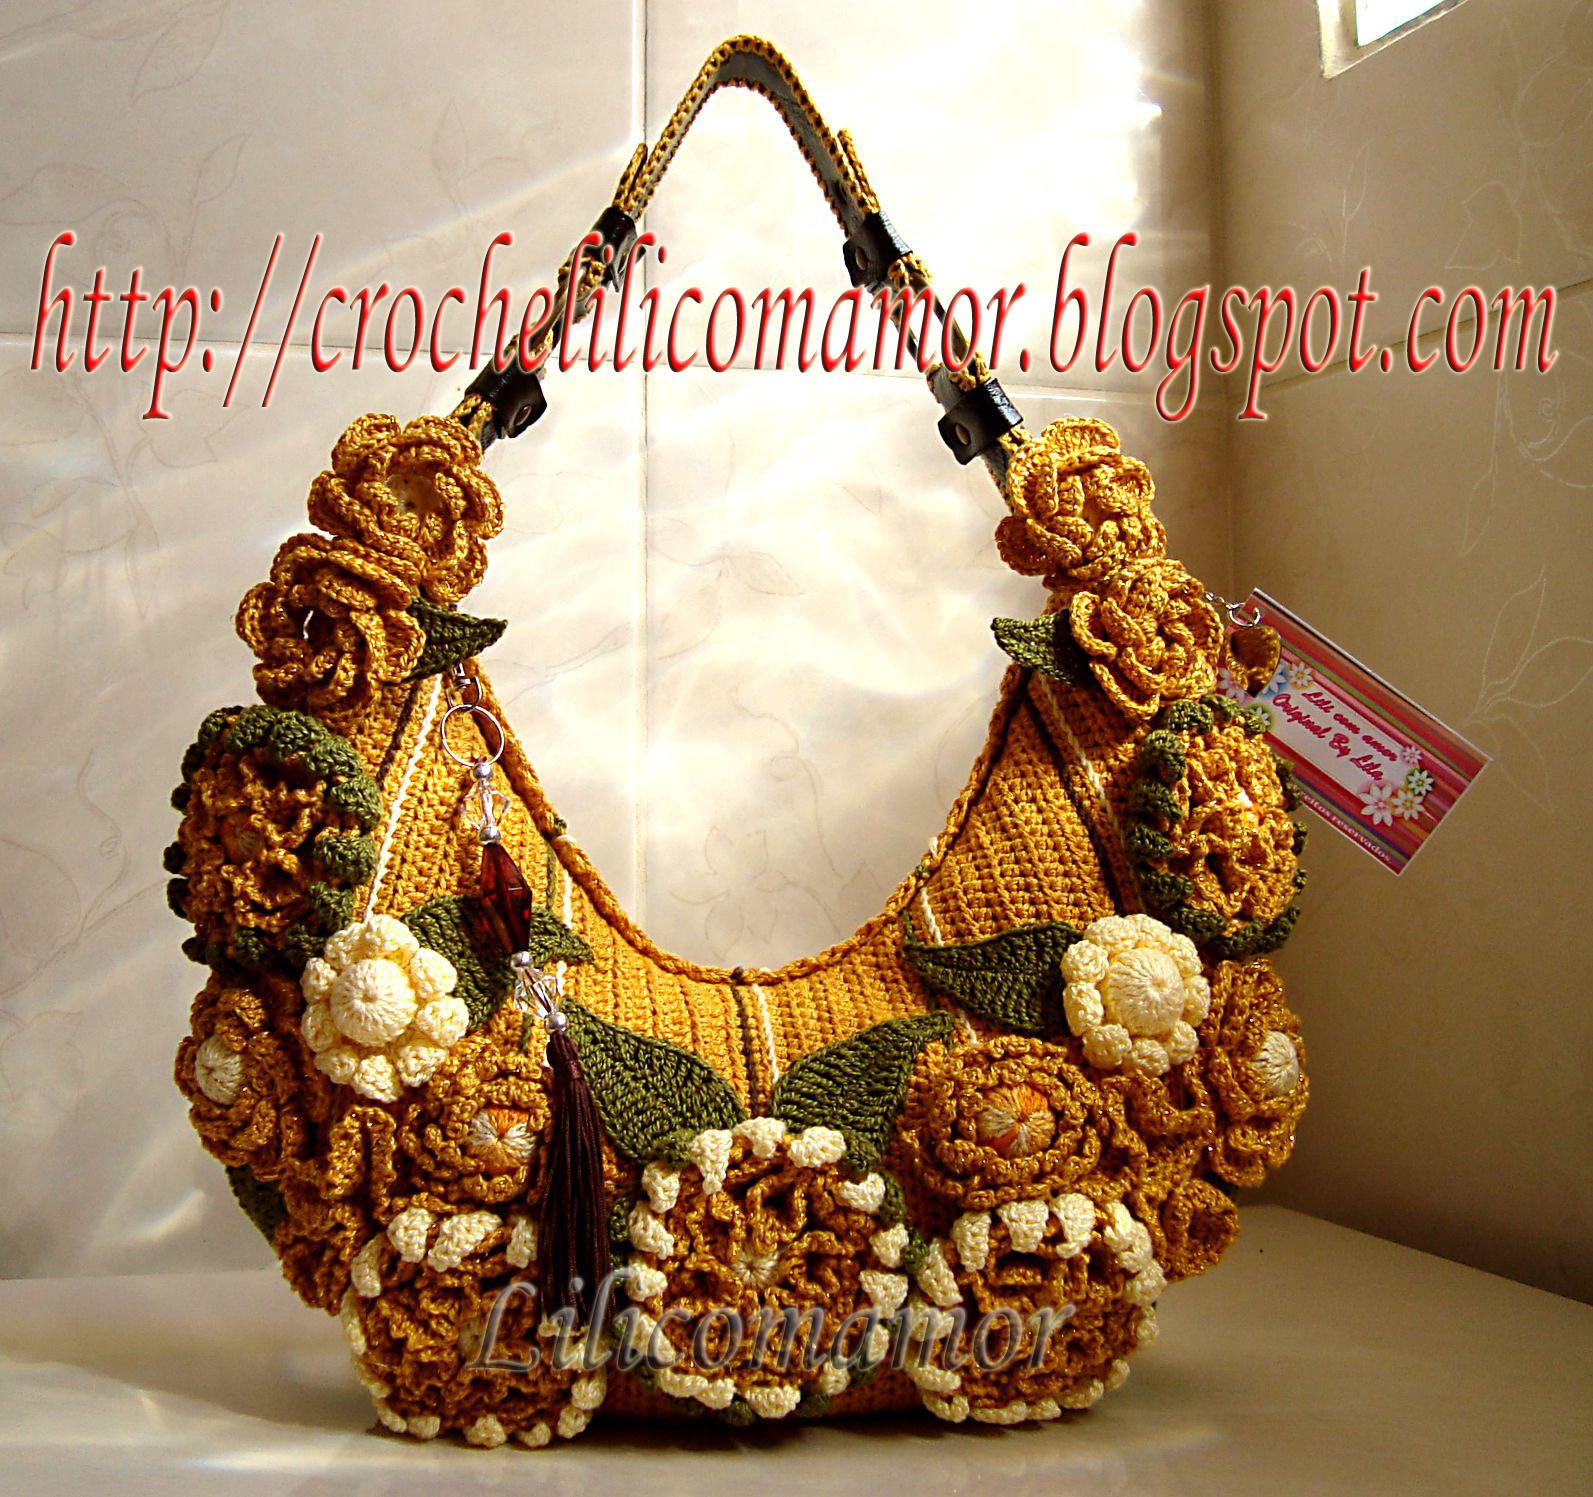 http://1.bp.blogspot.com/_Pn3epdt1AP0/TLpSMsTgLkI/AAAAAAAAEb0/Bfz5oO12o-E/s1600/BOLSA+LINDA+VERA+4.jpg